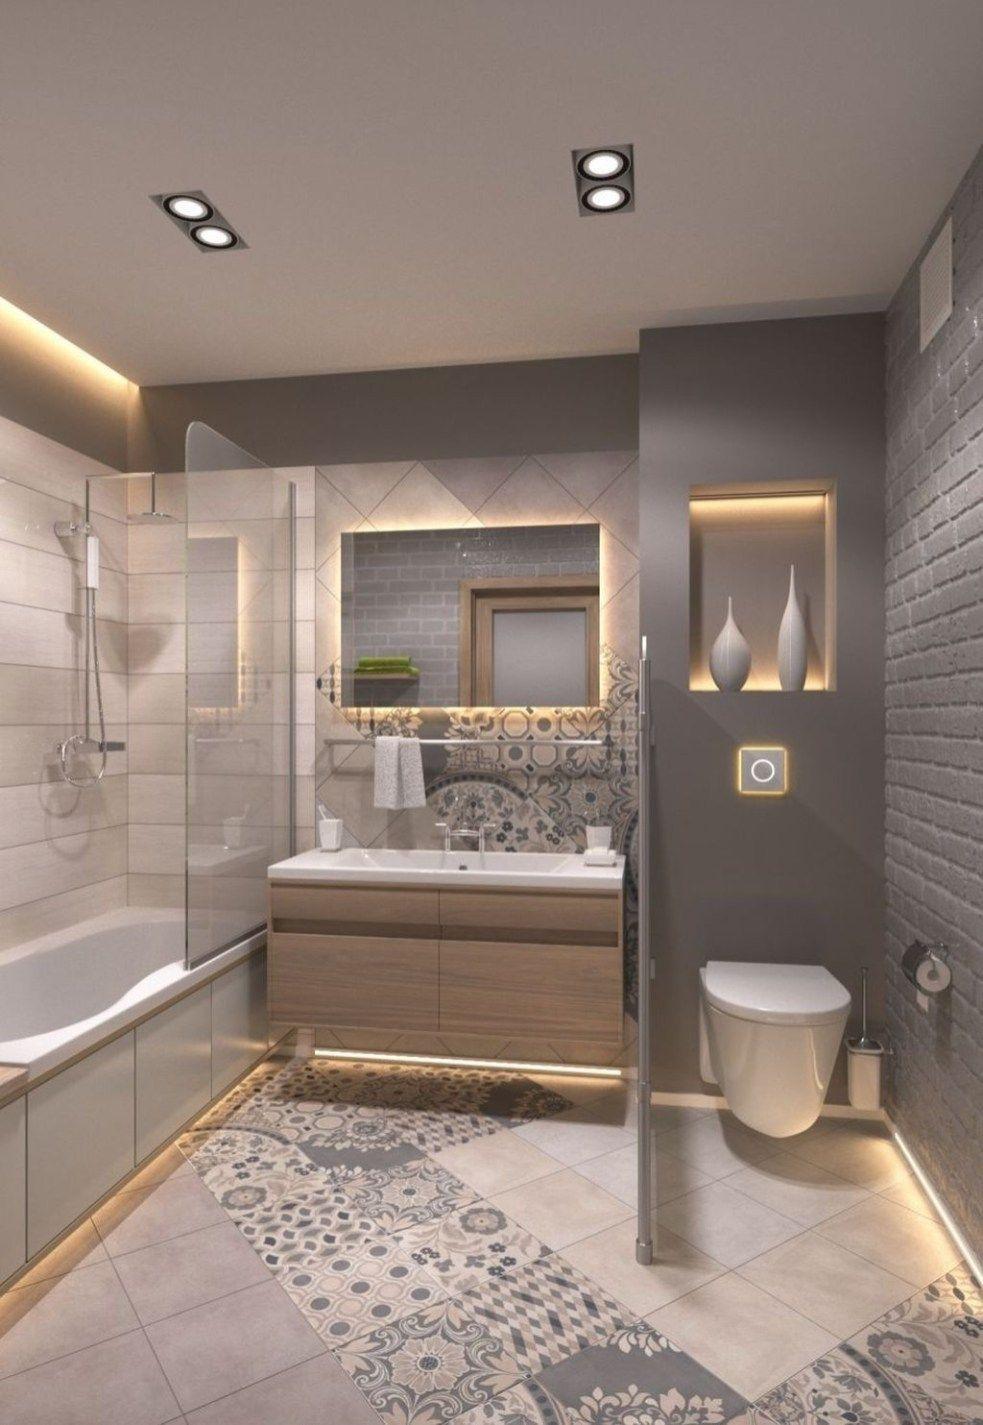 Fresh And Stylish Small Bathroom Remodel Add Storage Ideas Before After Small Bathroom Remo Small Bathroom Styles Bathroom Design Small Small Master Bathroom